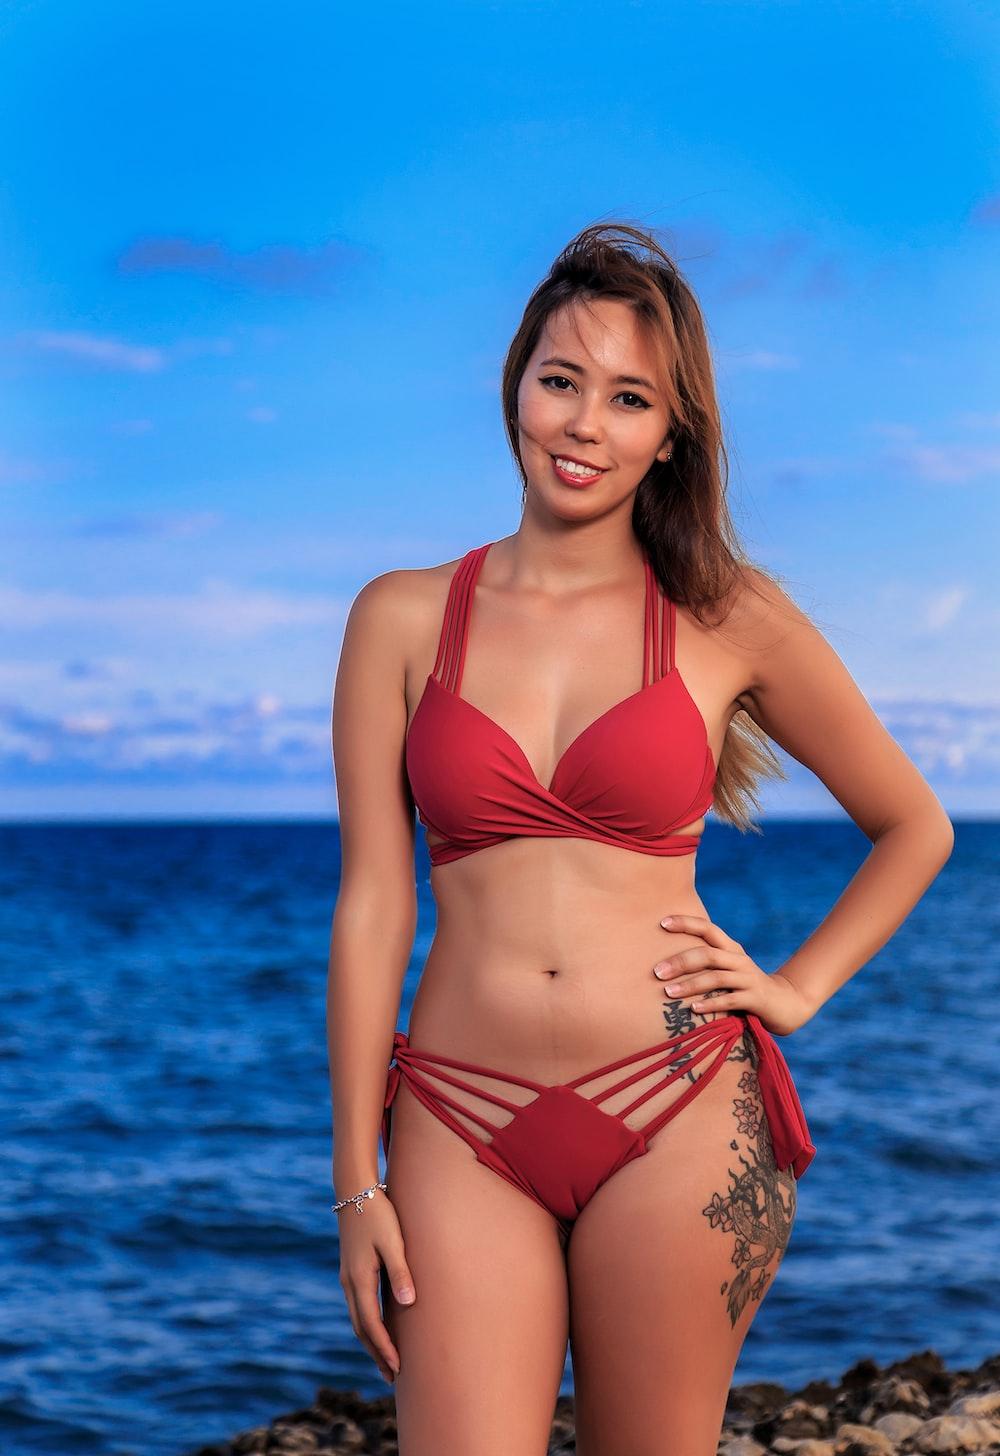 Hot girls in bikins 500 Hot Bikini Pictures Hd Download Free Images On Unsplash